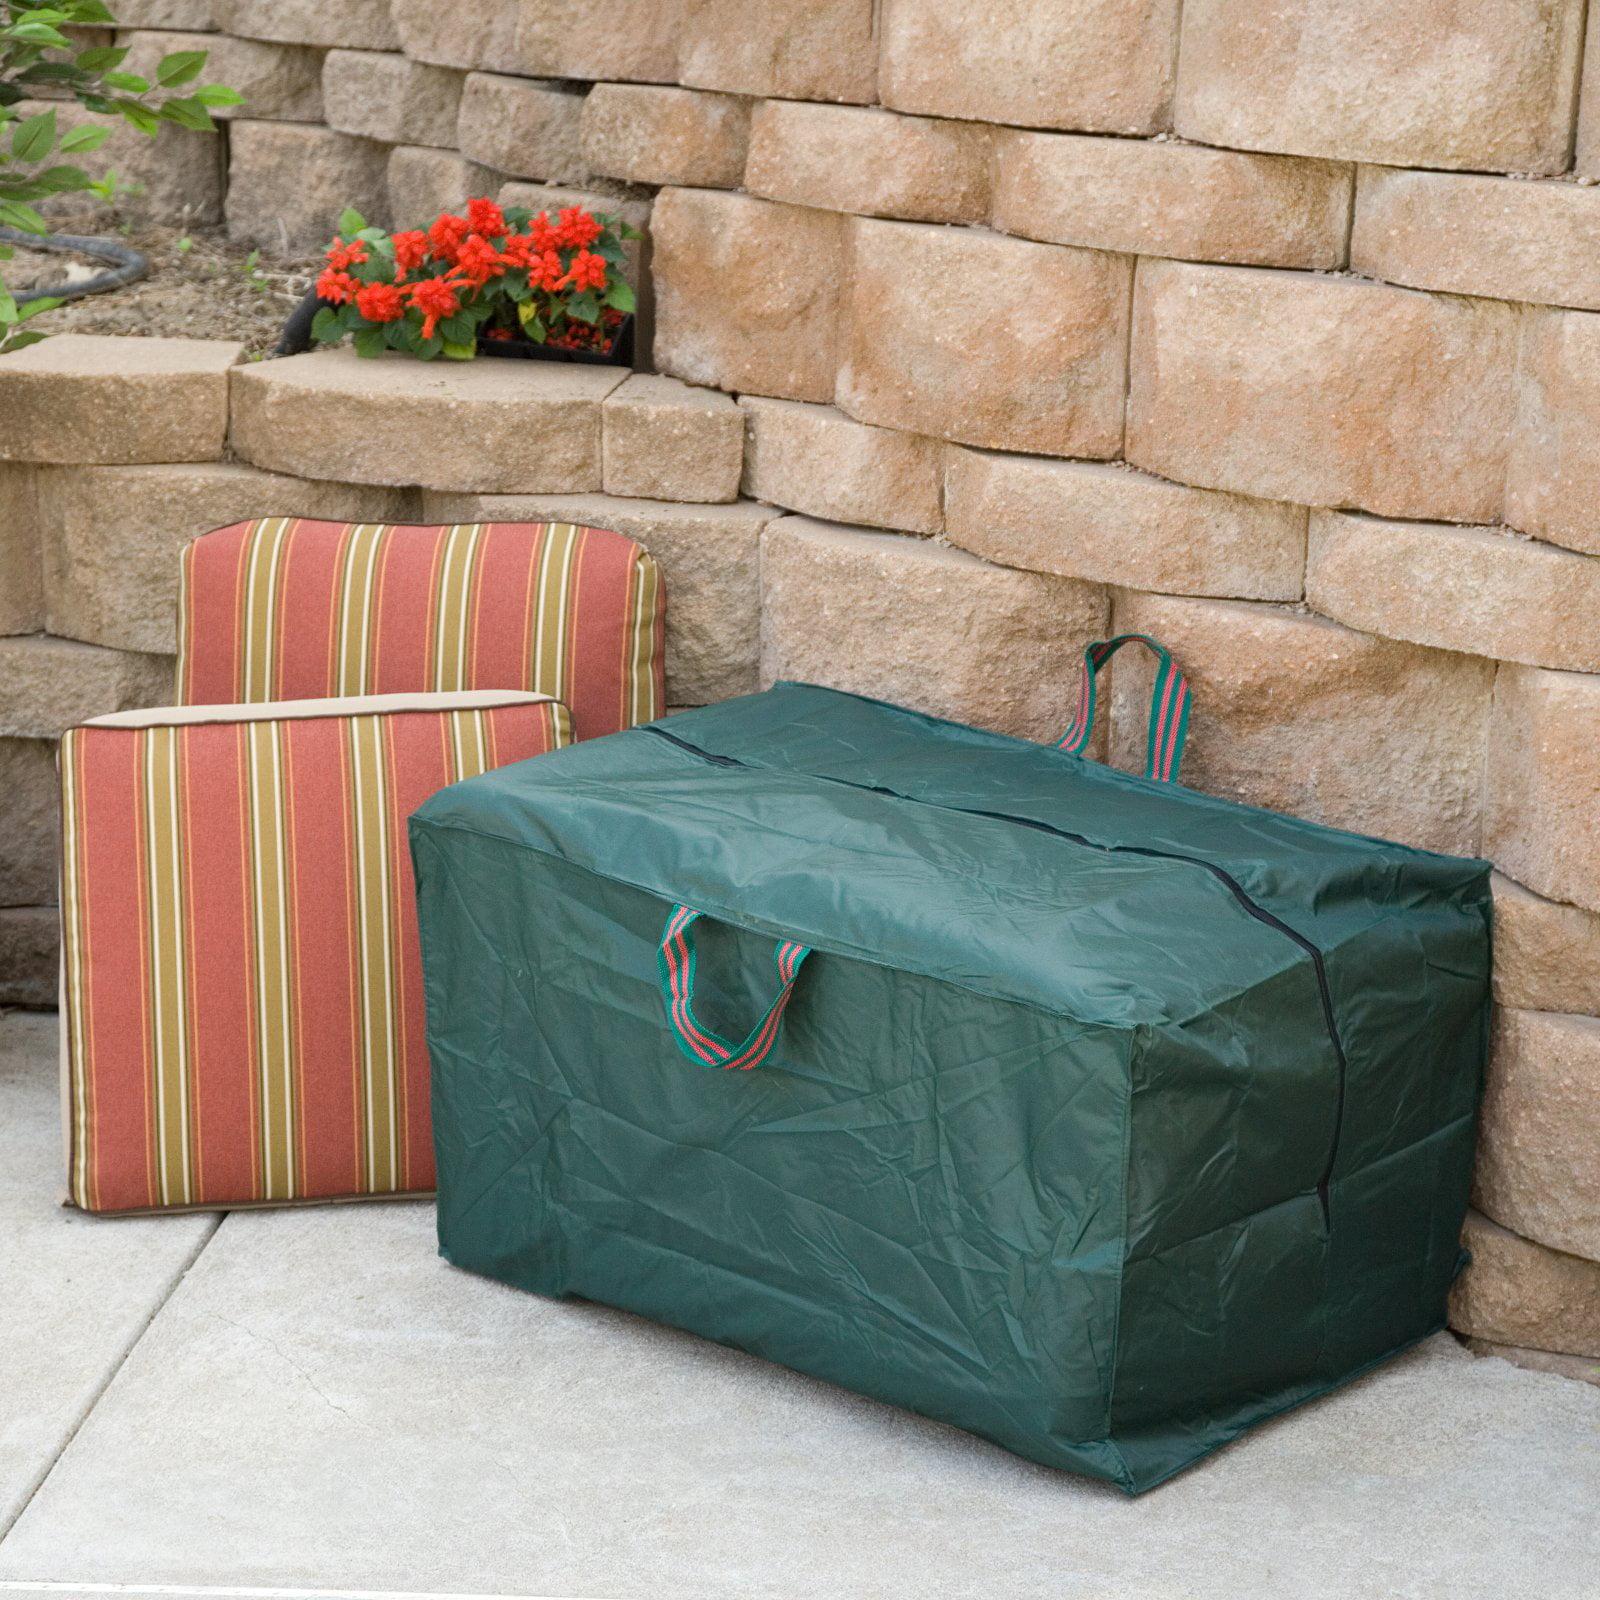 Bosmere Outdoor Cushion Sto-Away